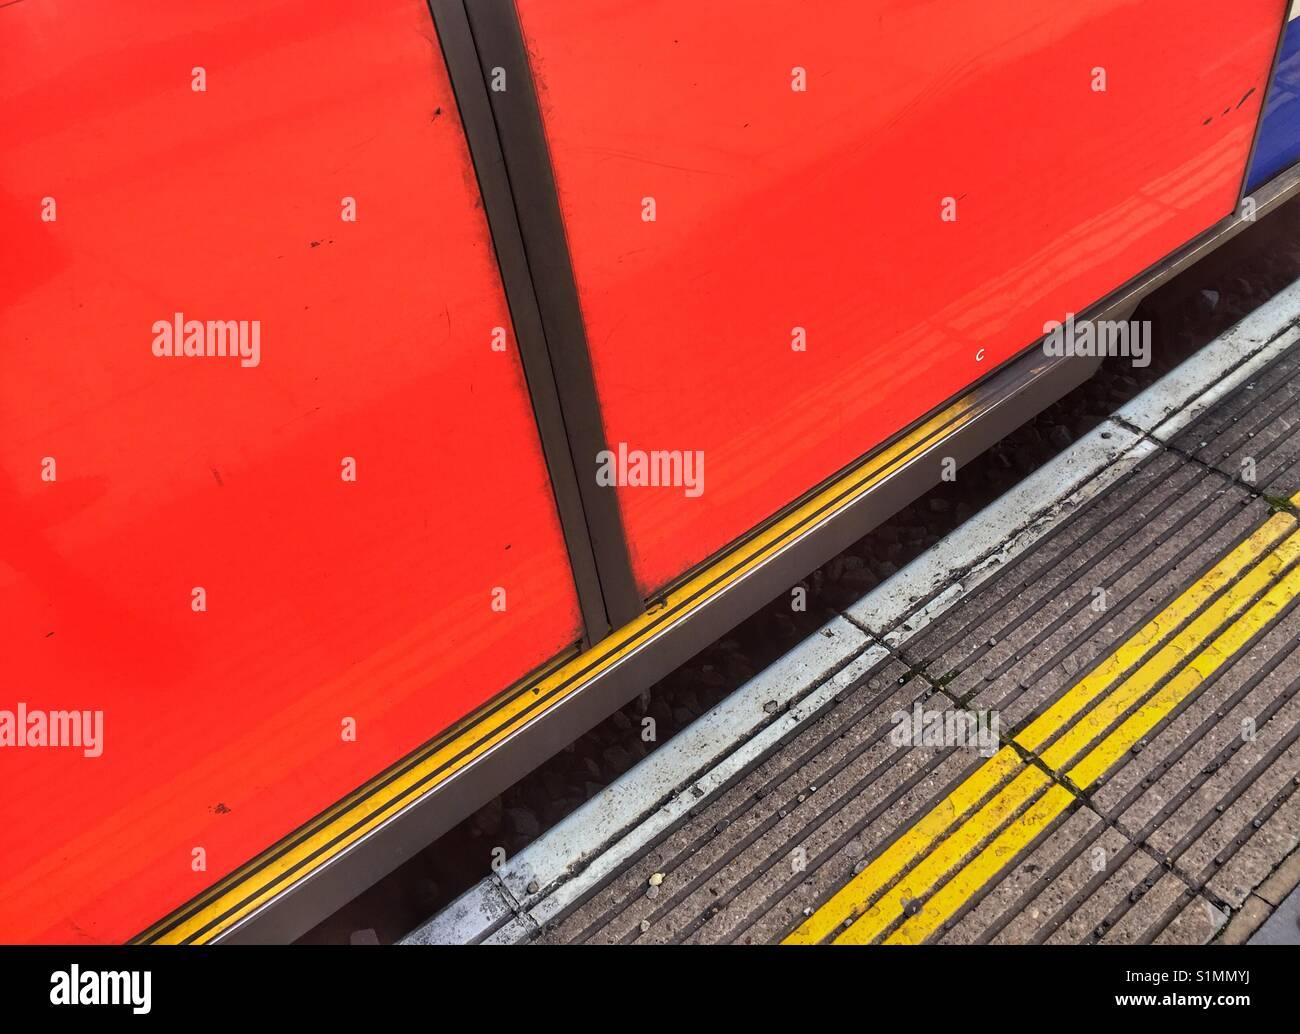 Tube train - Stock Image